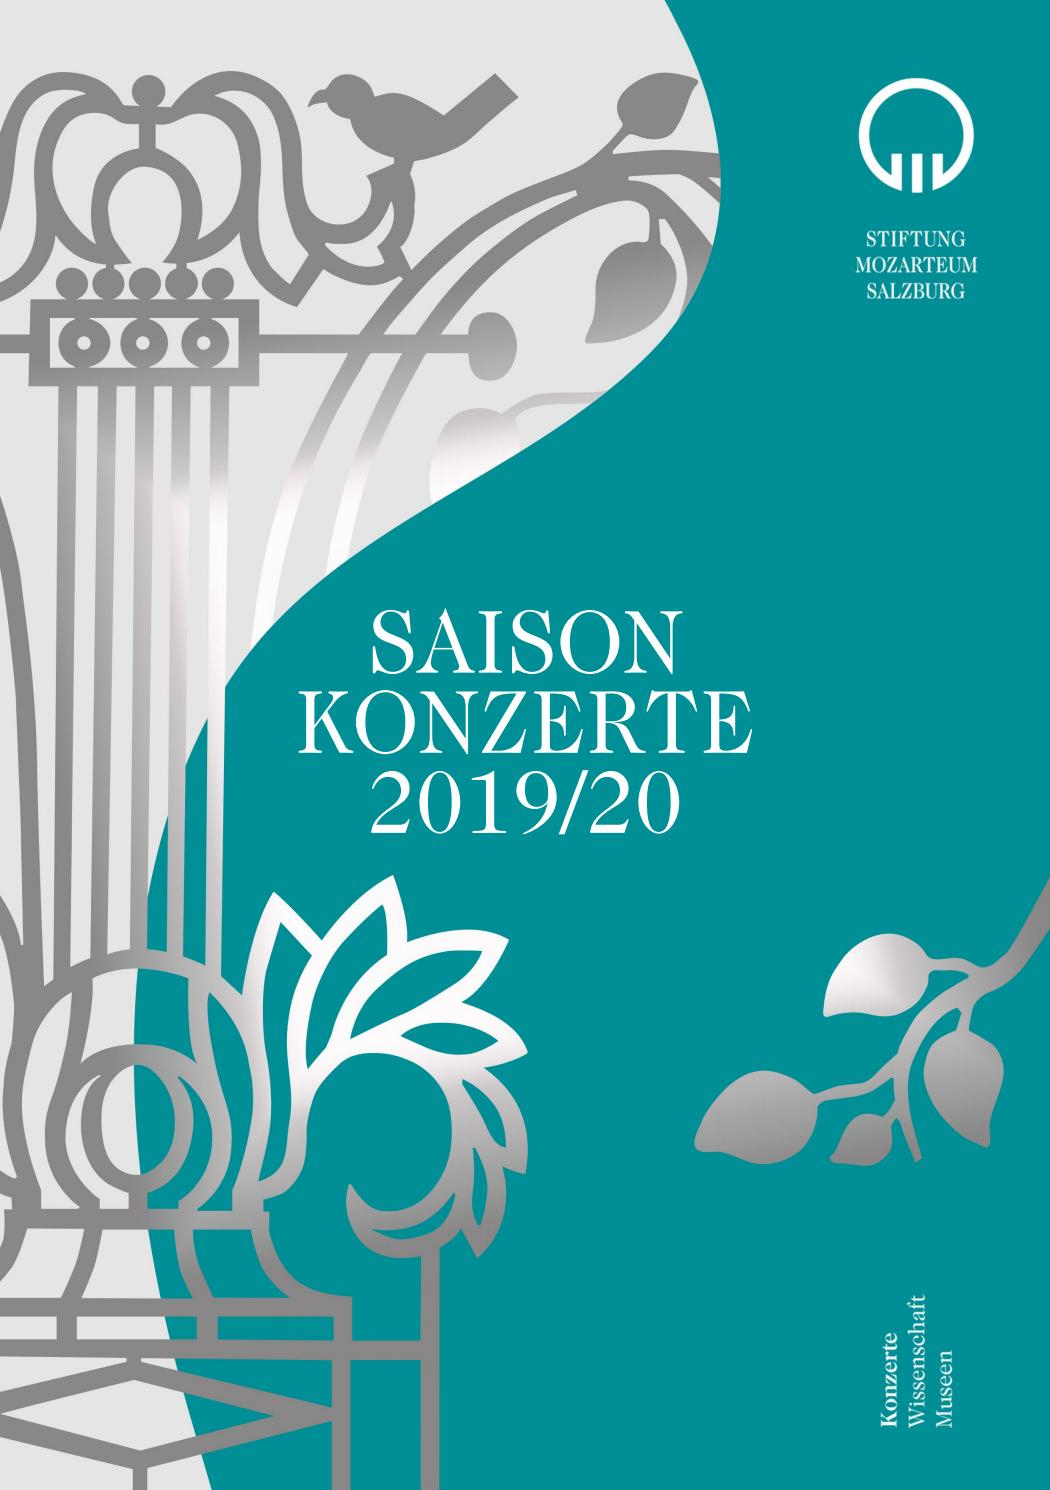 Saison Konzerte 2019/20 By Stiftung Mozarteum Salzburg - Issuu destiné Album Printemps Gs